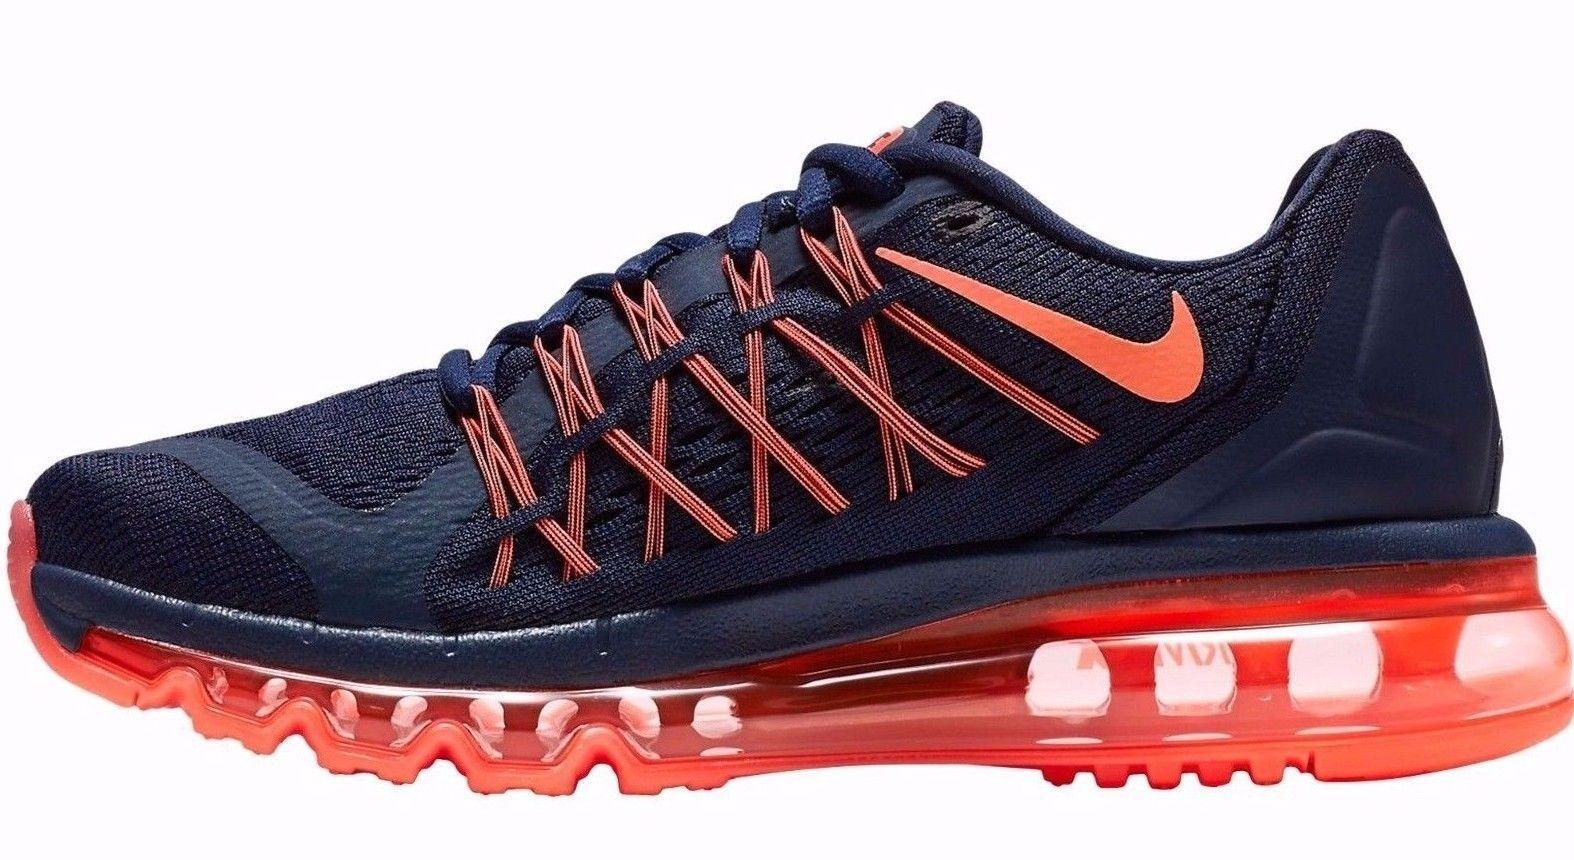 NEW Nike AIR MAX 2015 Women's US sz: 6 and 28 similar items